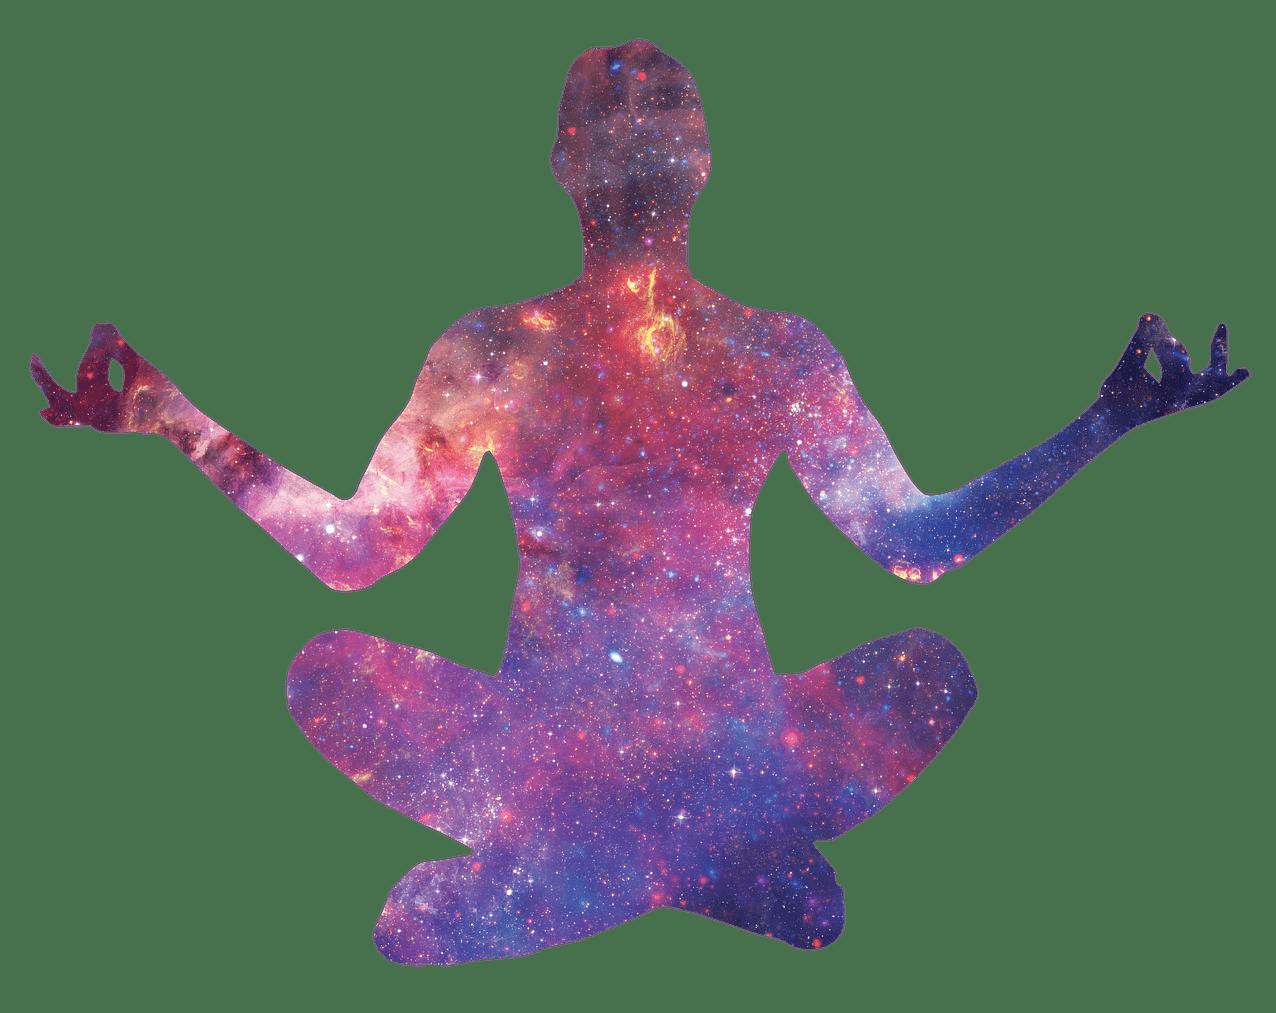 http://www.katharina-sieglinde-soreia-helmich.de/wp-content/uploads/2017/05/yoga-2150140_1280-2.png